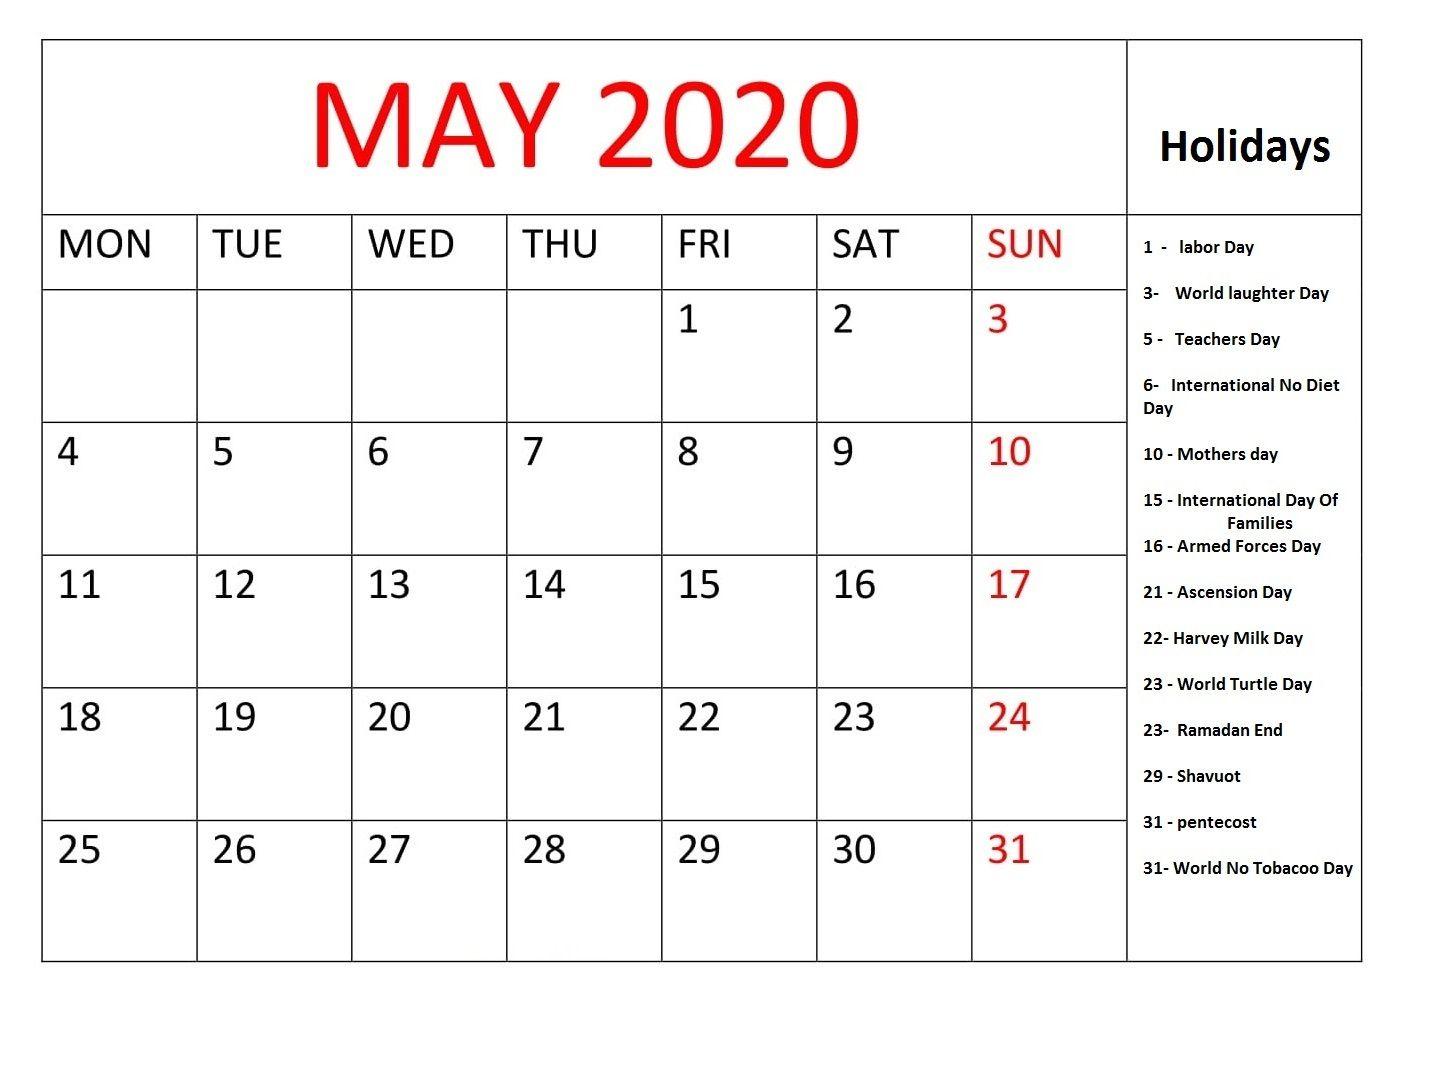 May 2020 Holidays Calendar Usa Uk Canada India Australia In